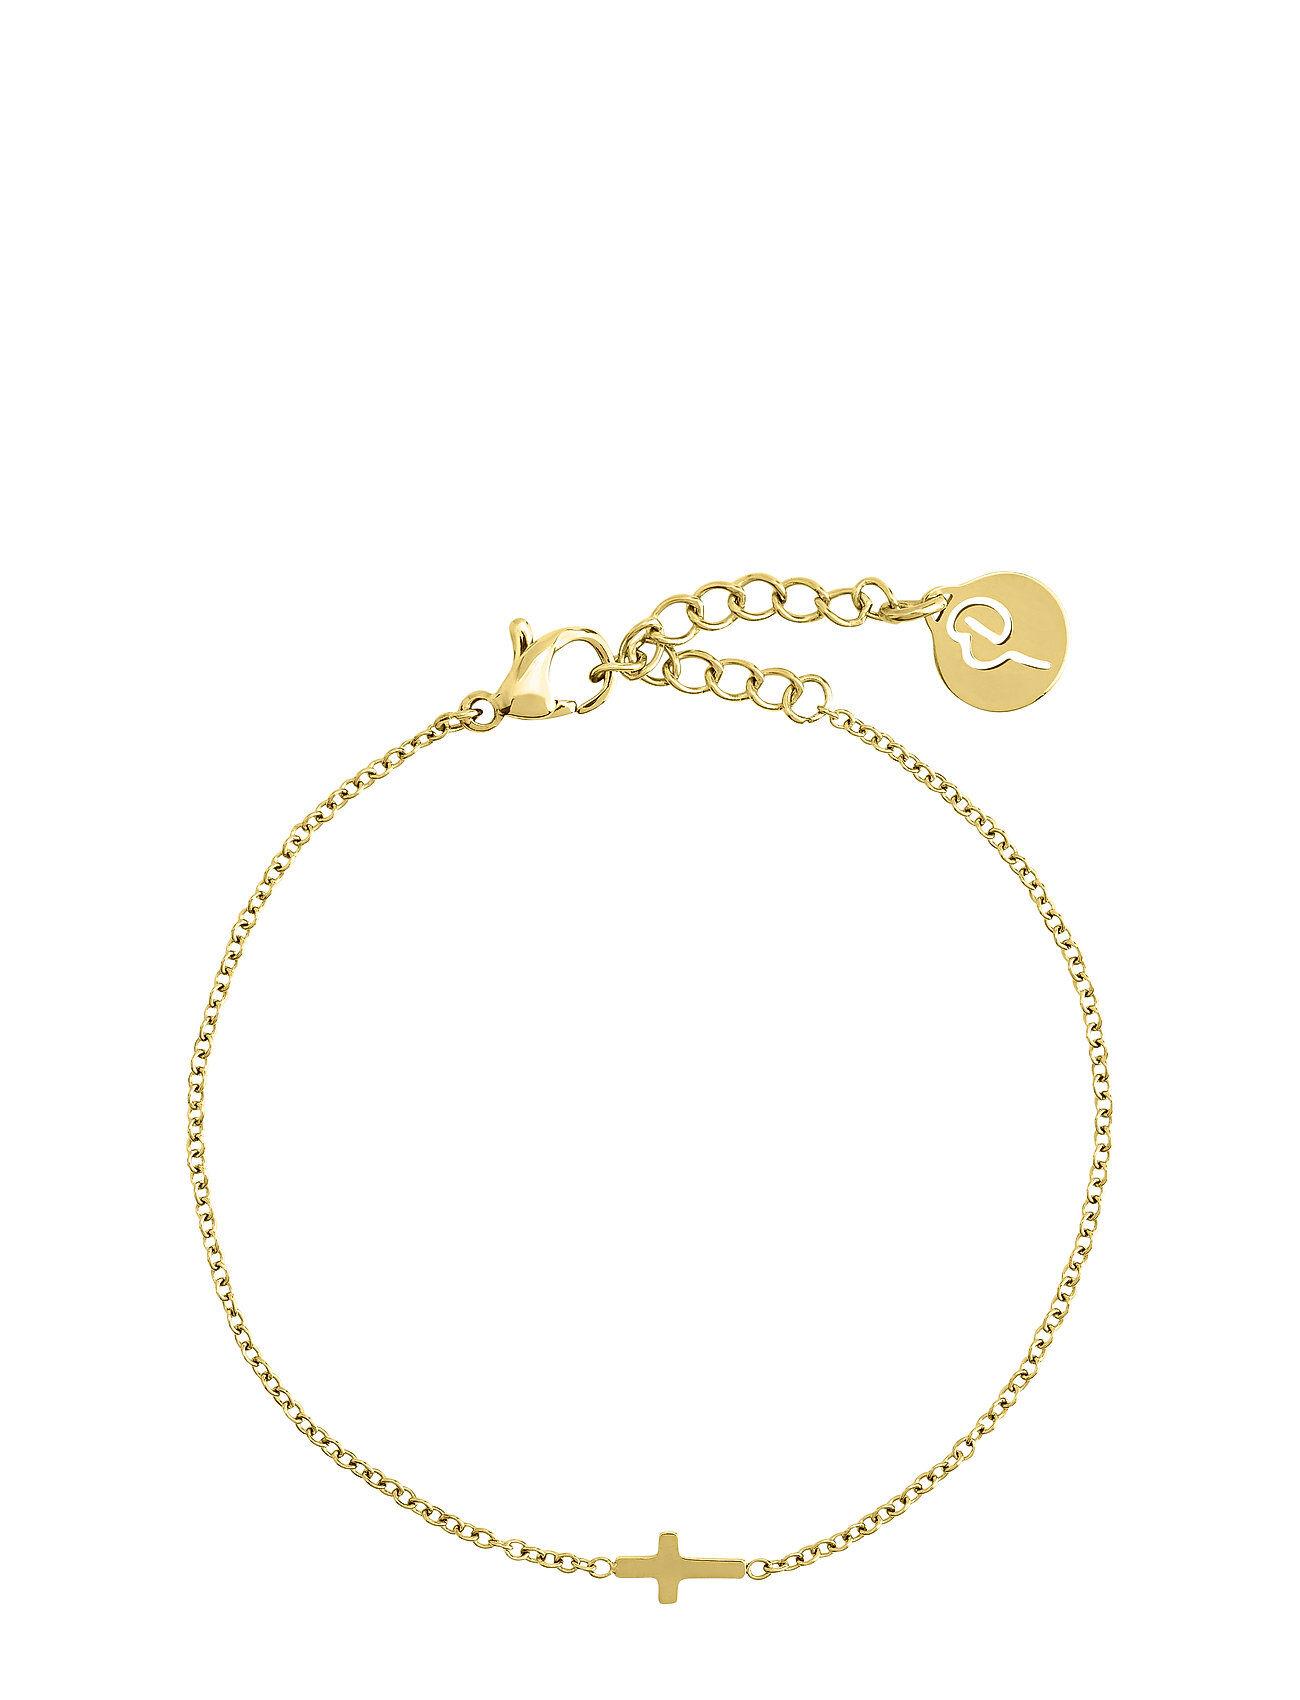 Edblad Cross Bracelet Gold Accessories Jewellery Bracelets Chain Bracelets Kulta Edblad